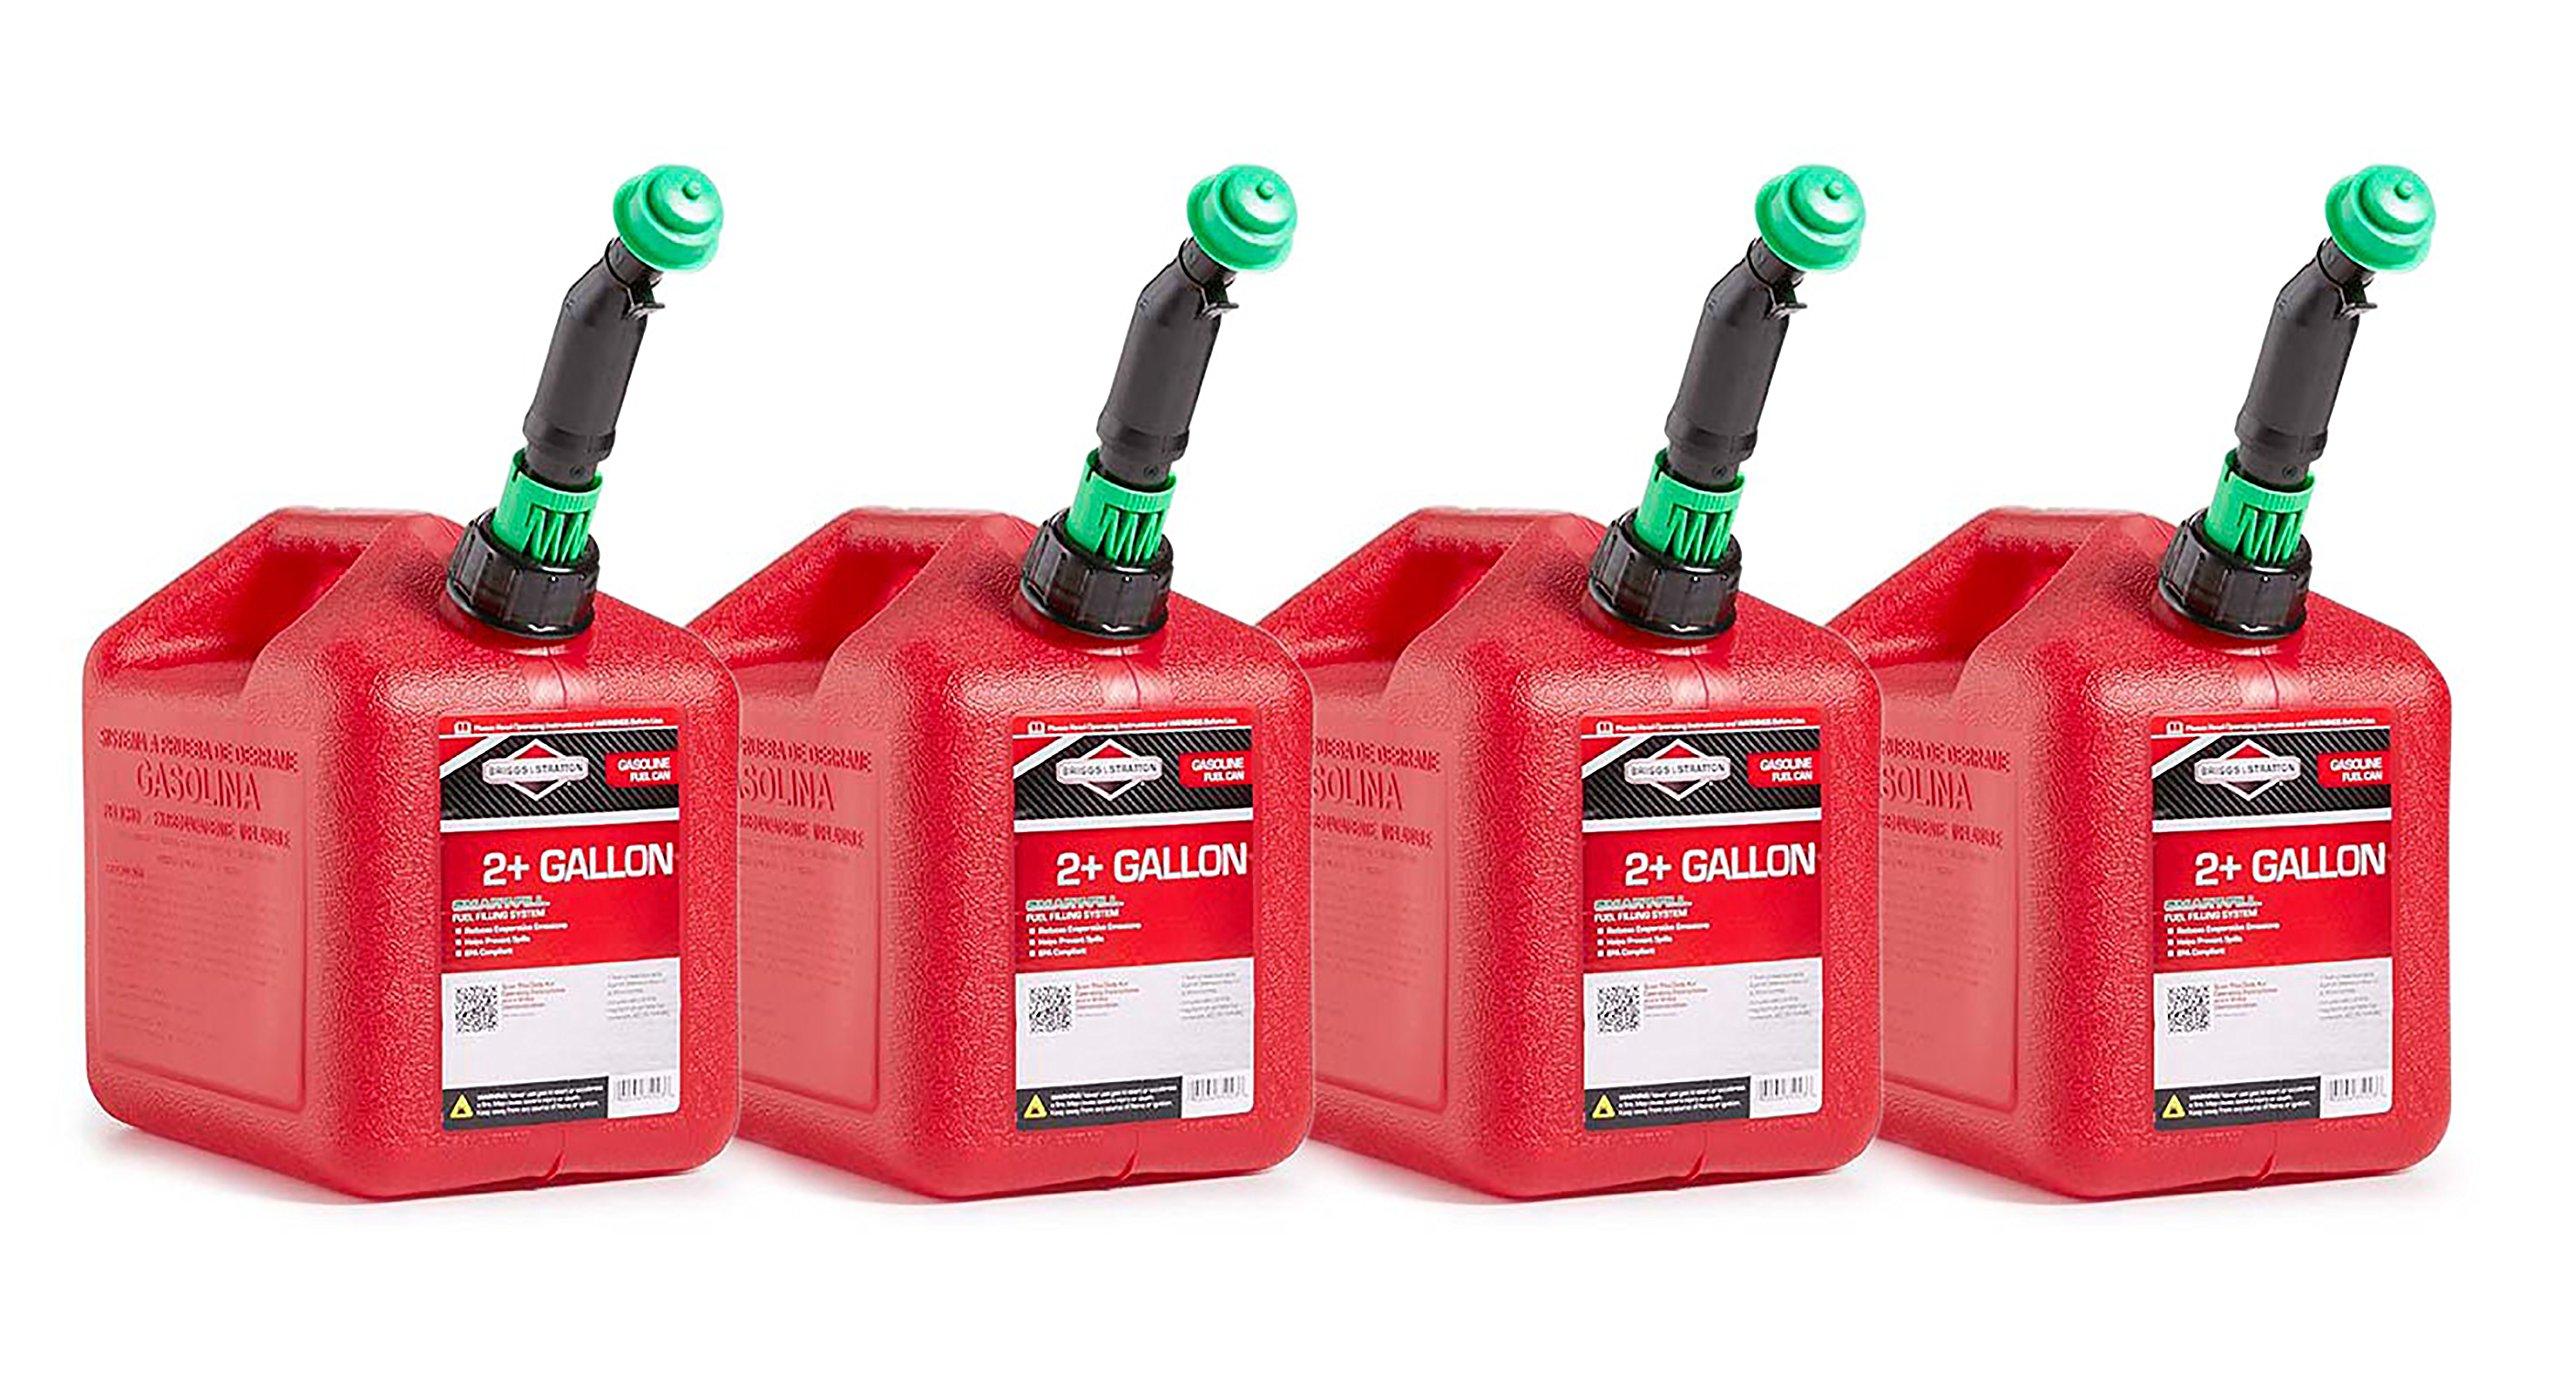 Briggs & Stratton 86023 Smart-Fill 2+ Gallon Gas Cans (4 Pack)